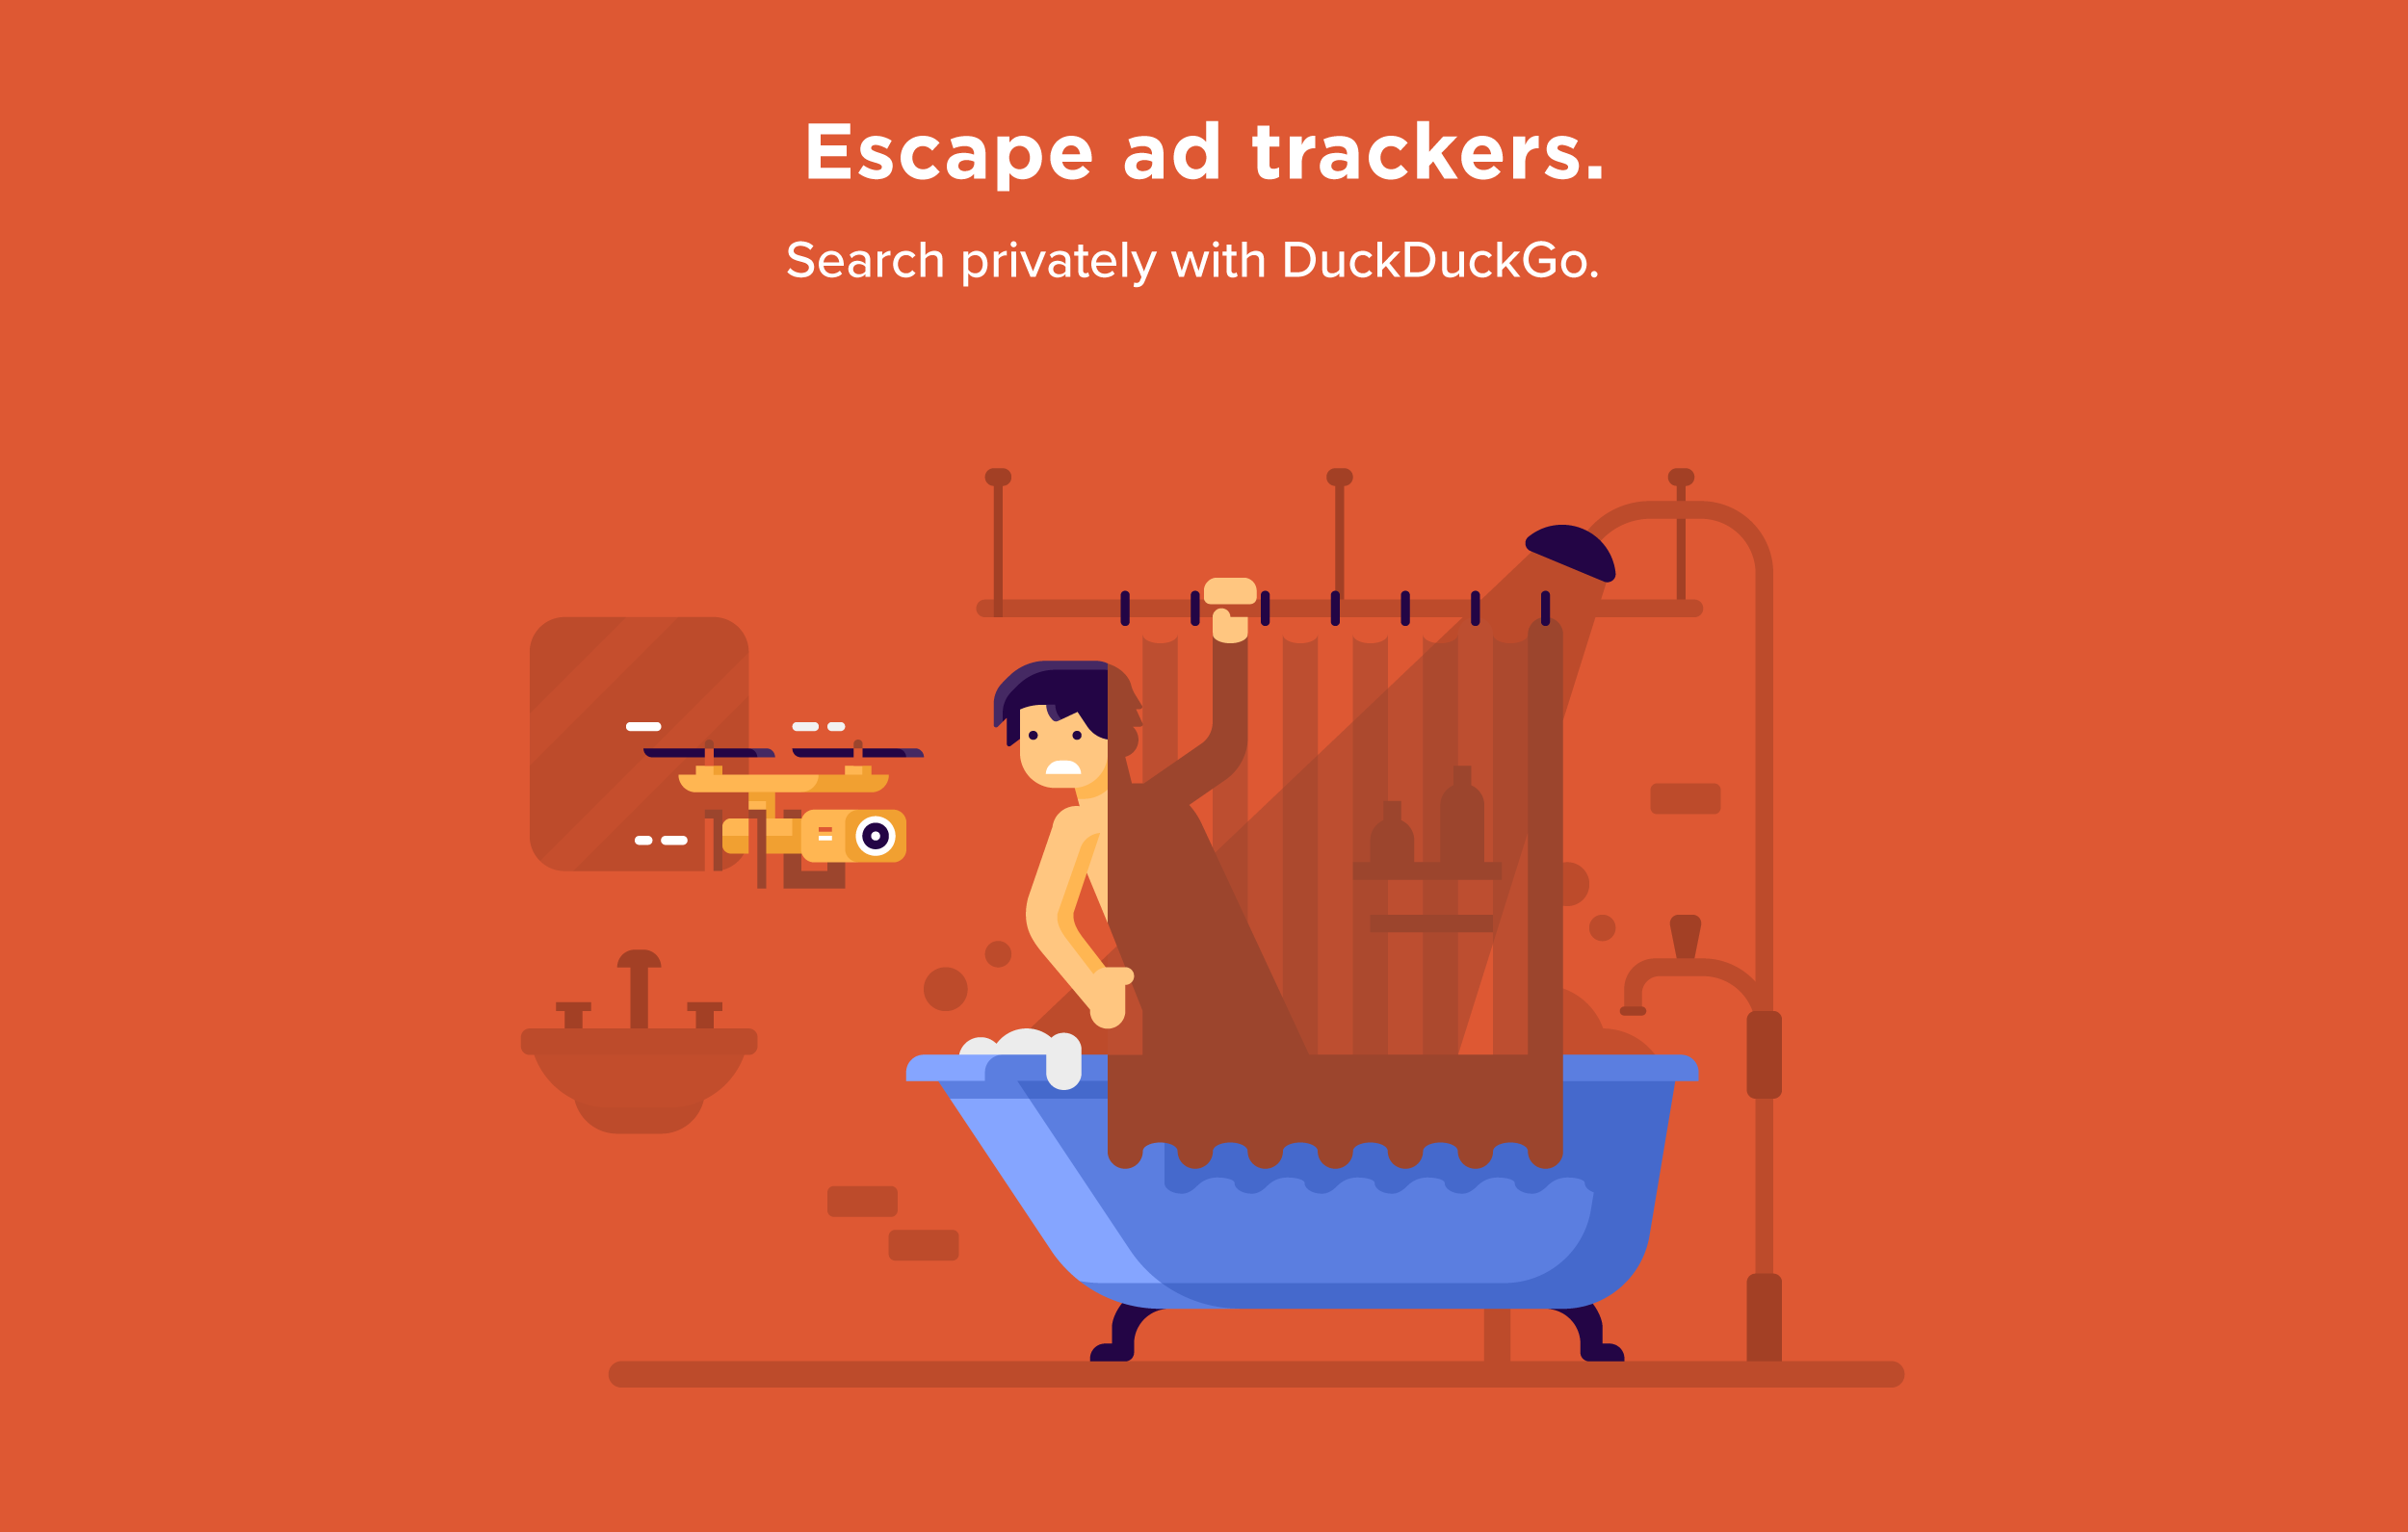 Matt Anderson DuckDuckGo character scenes. Creepy drone tracking man in home.